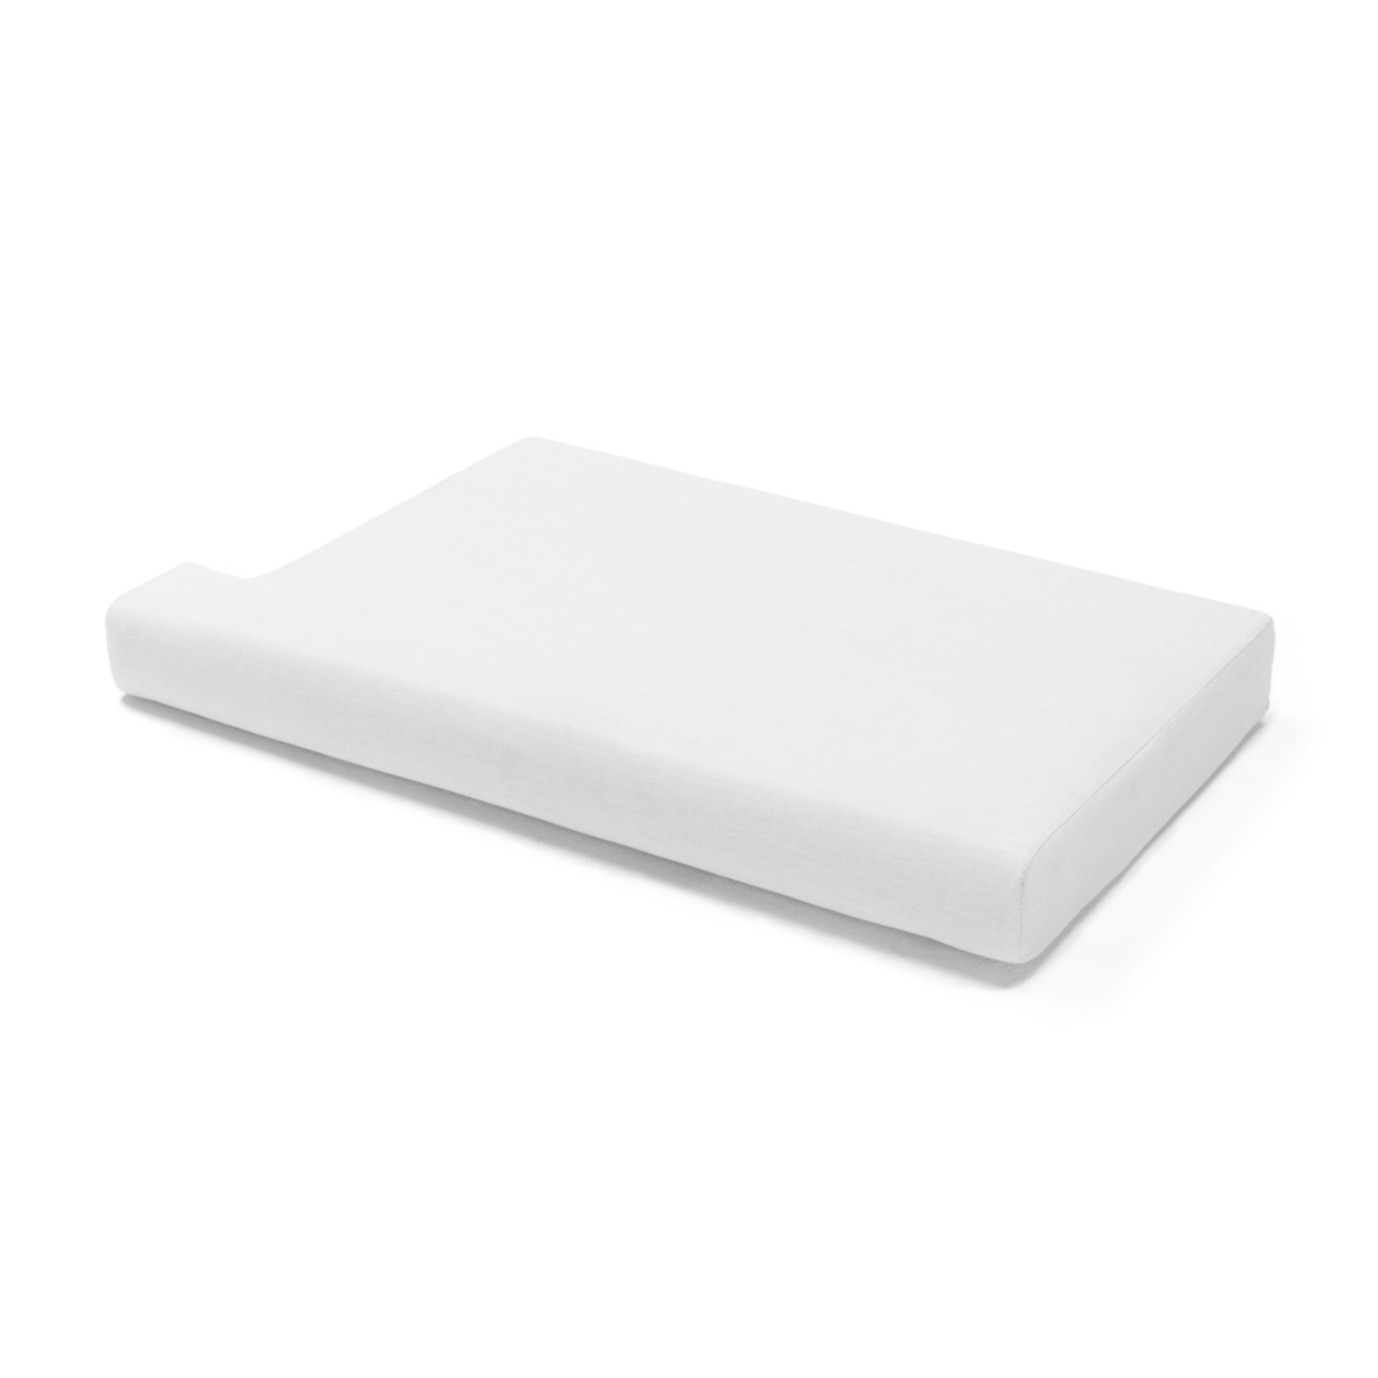 Portofino Sling 96in Sofa Right Base Cushion - Beige Fennel